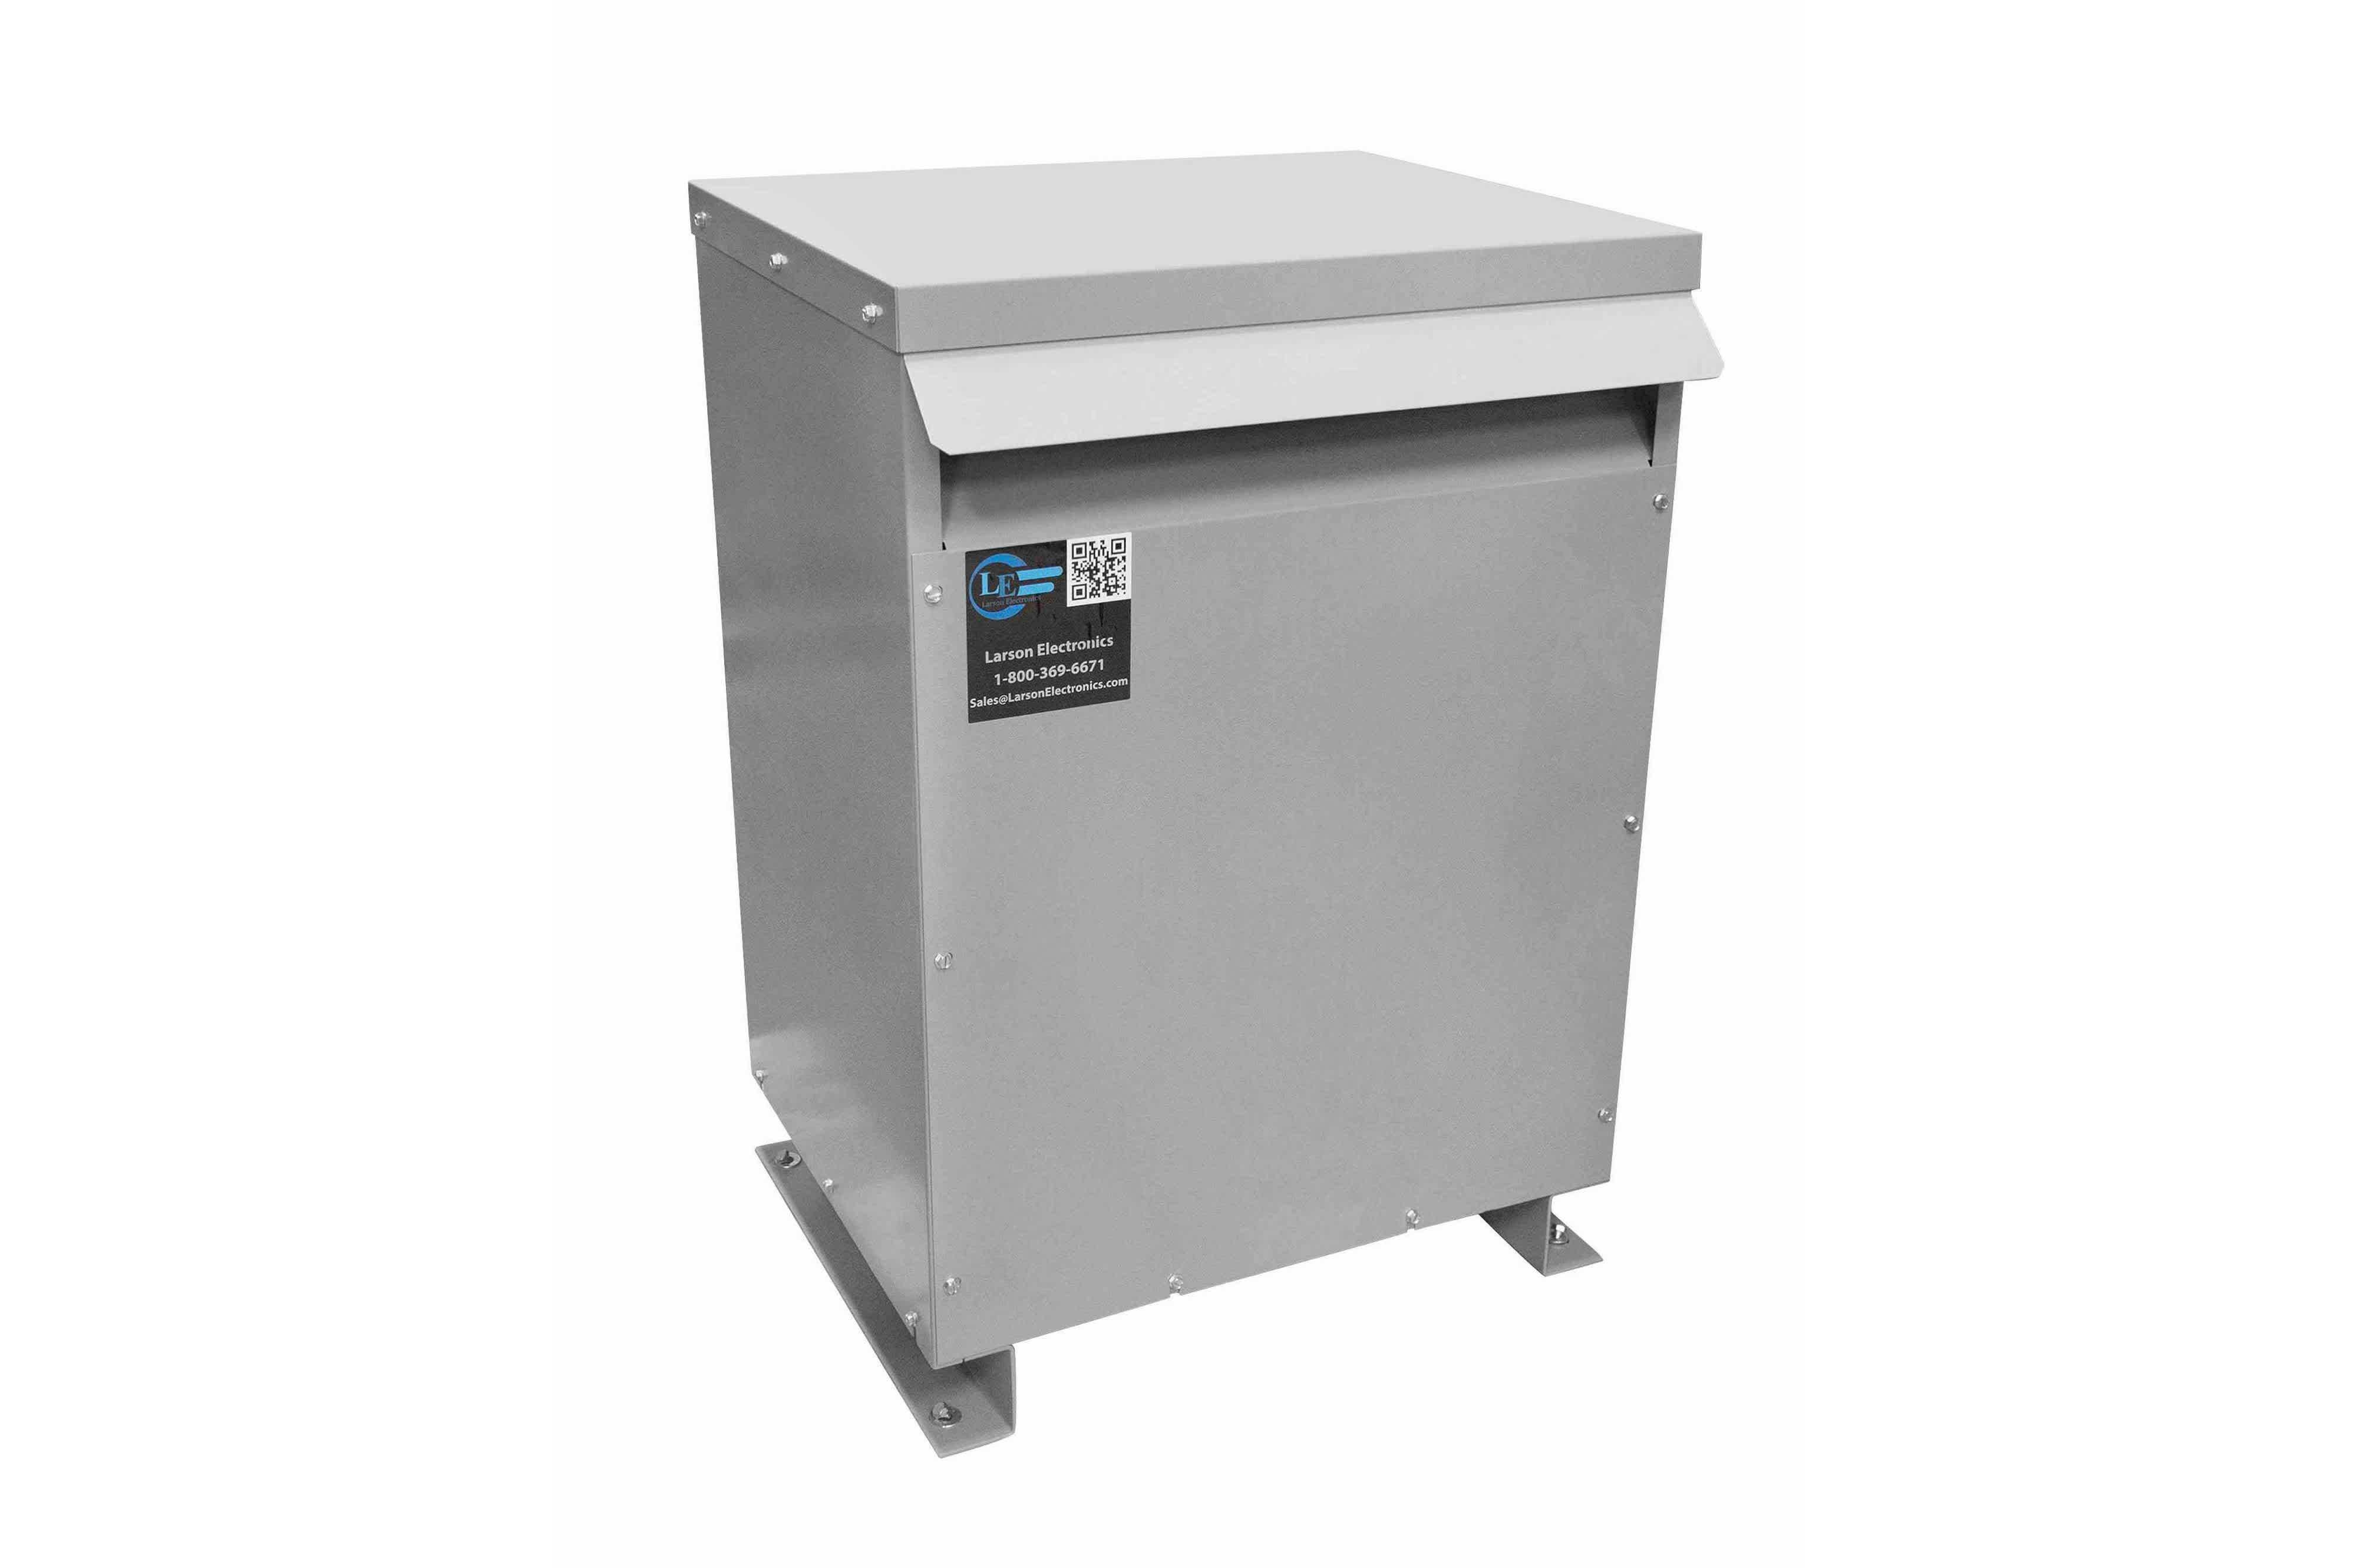 110 kVA 3PH Isolation Transformer, 220V Wye Primary, 480Y/277 Wye-N Secondary, N3R, Ventilated, 60 Hz